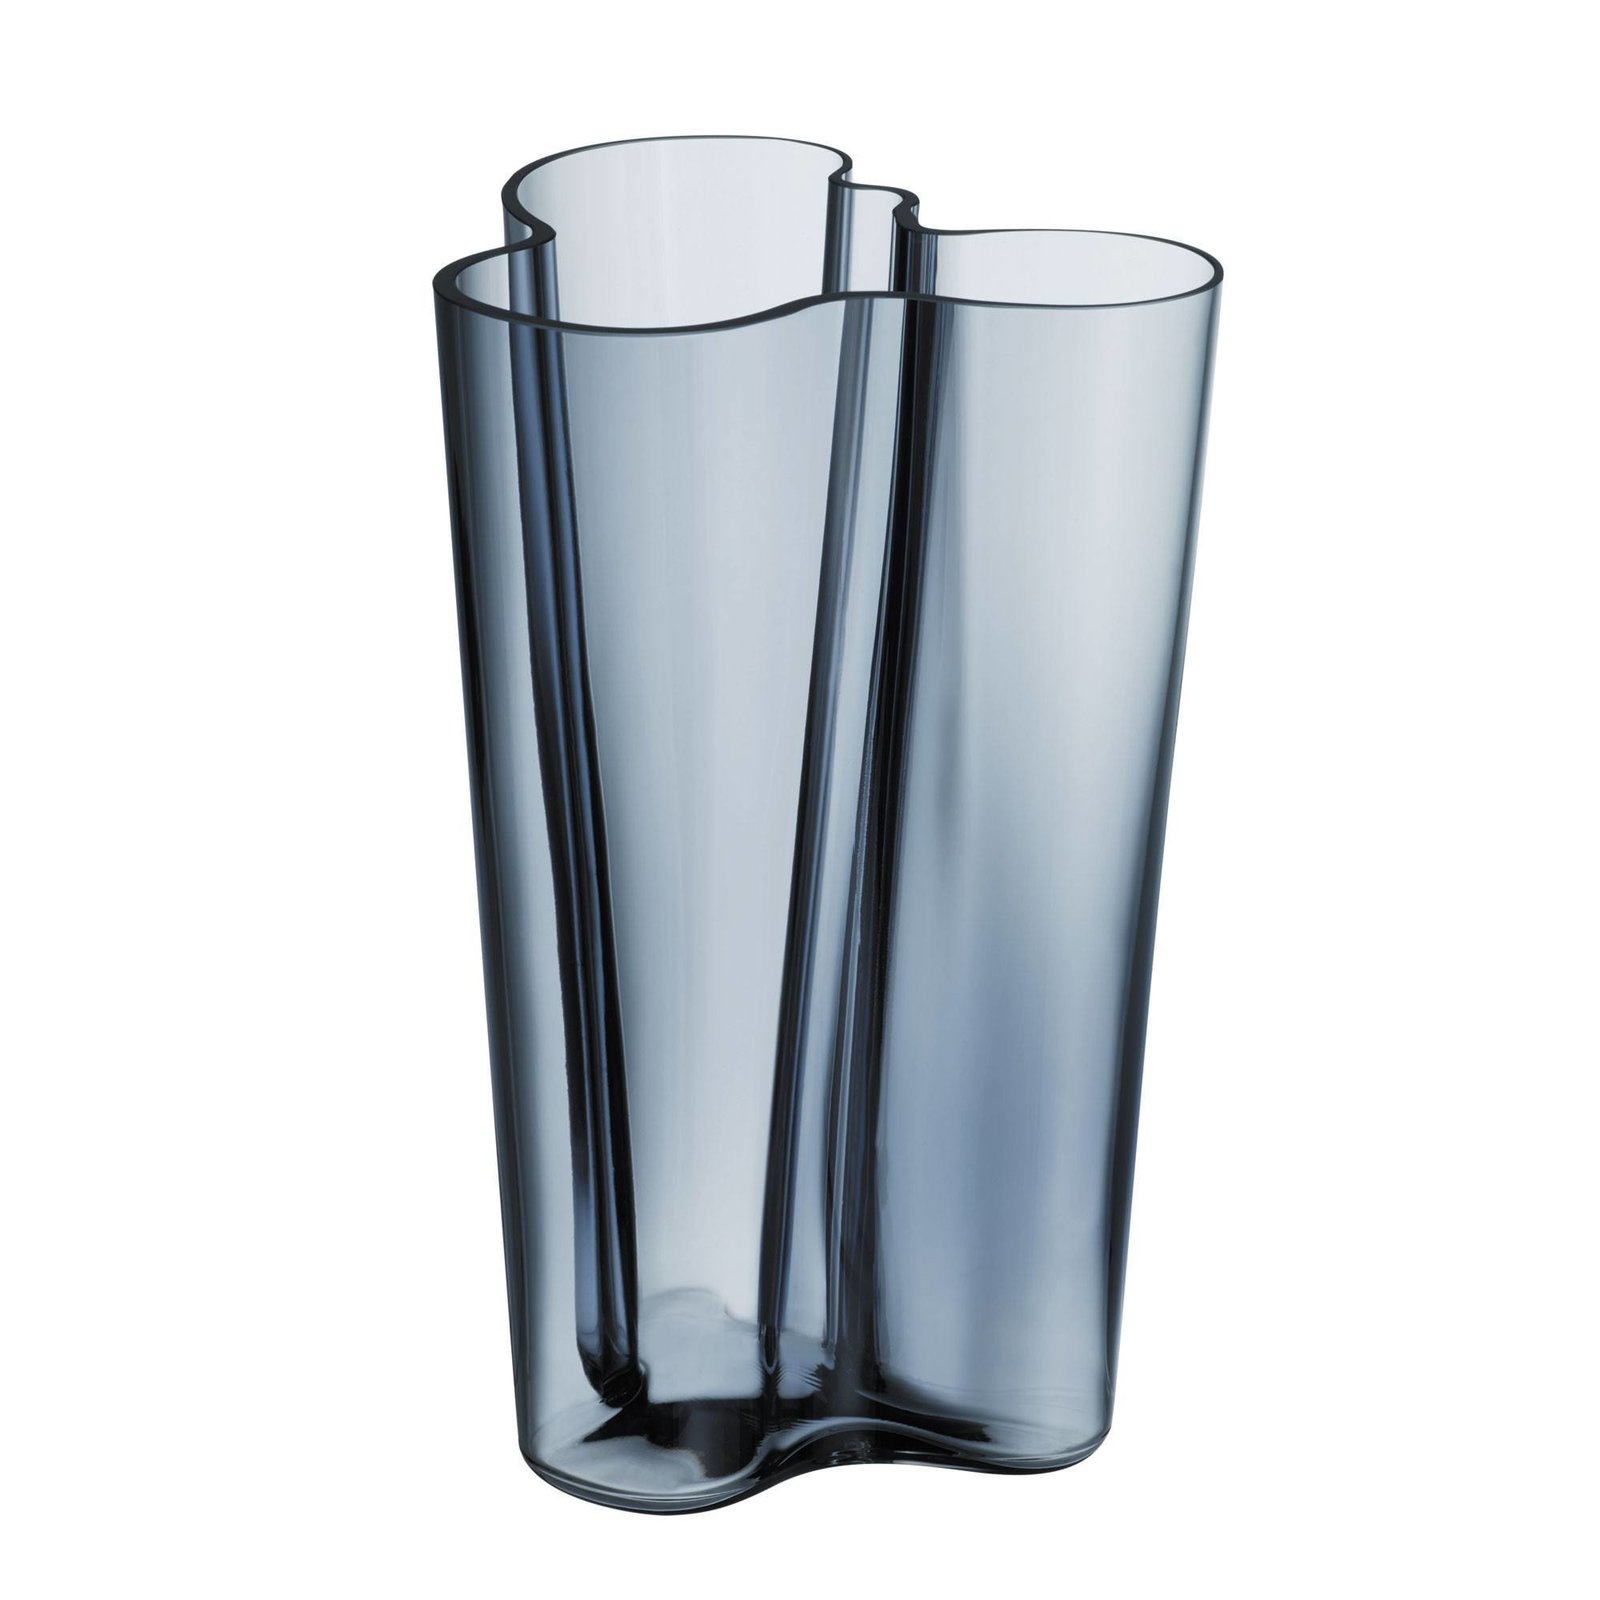 Iittala aalto finlandia vase by lumens dwell reviewsmspy